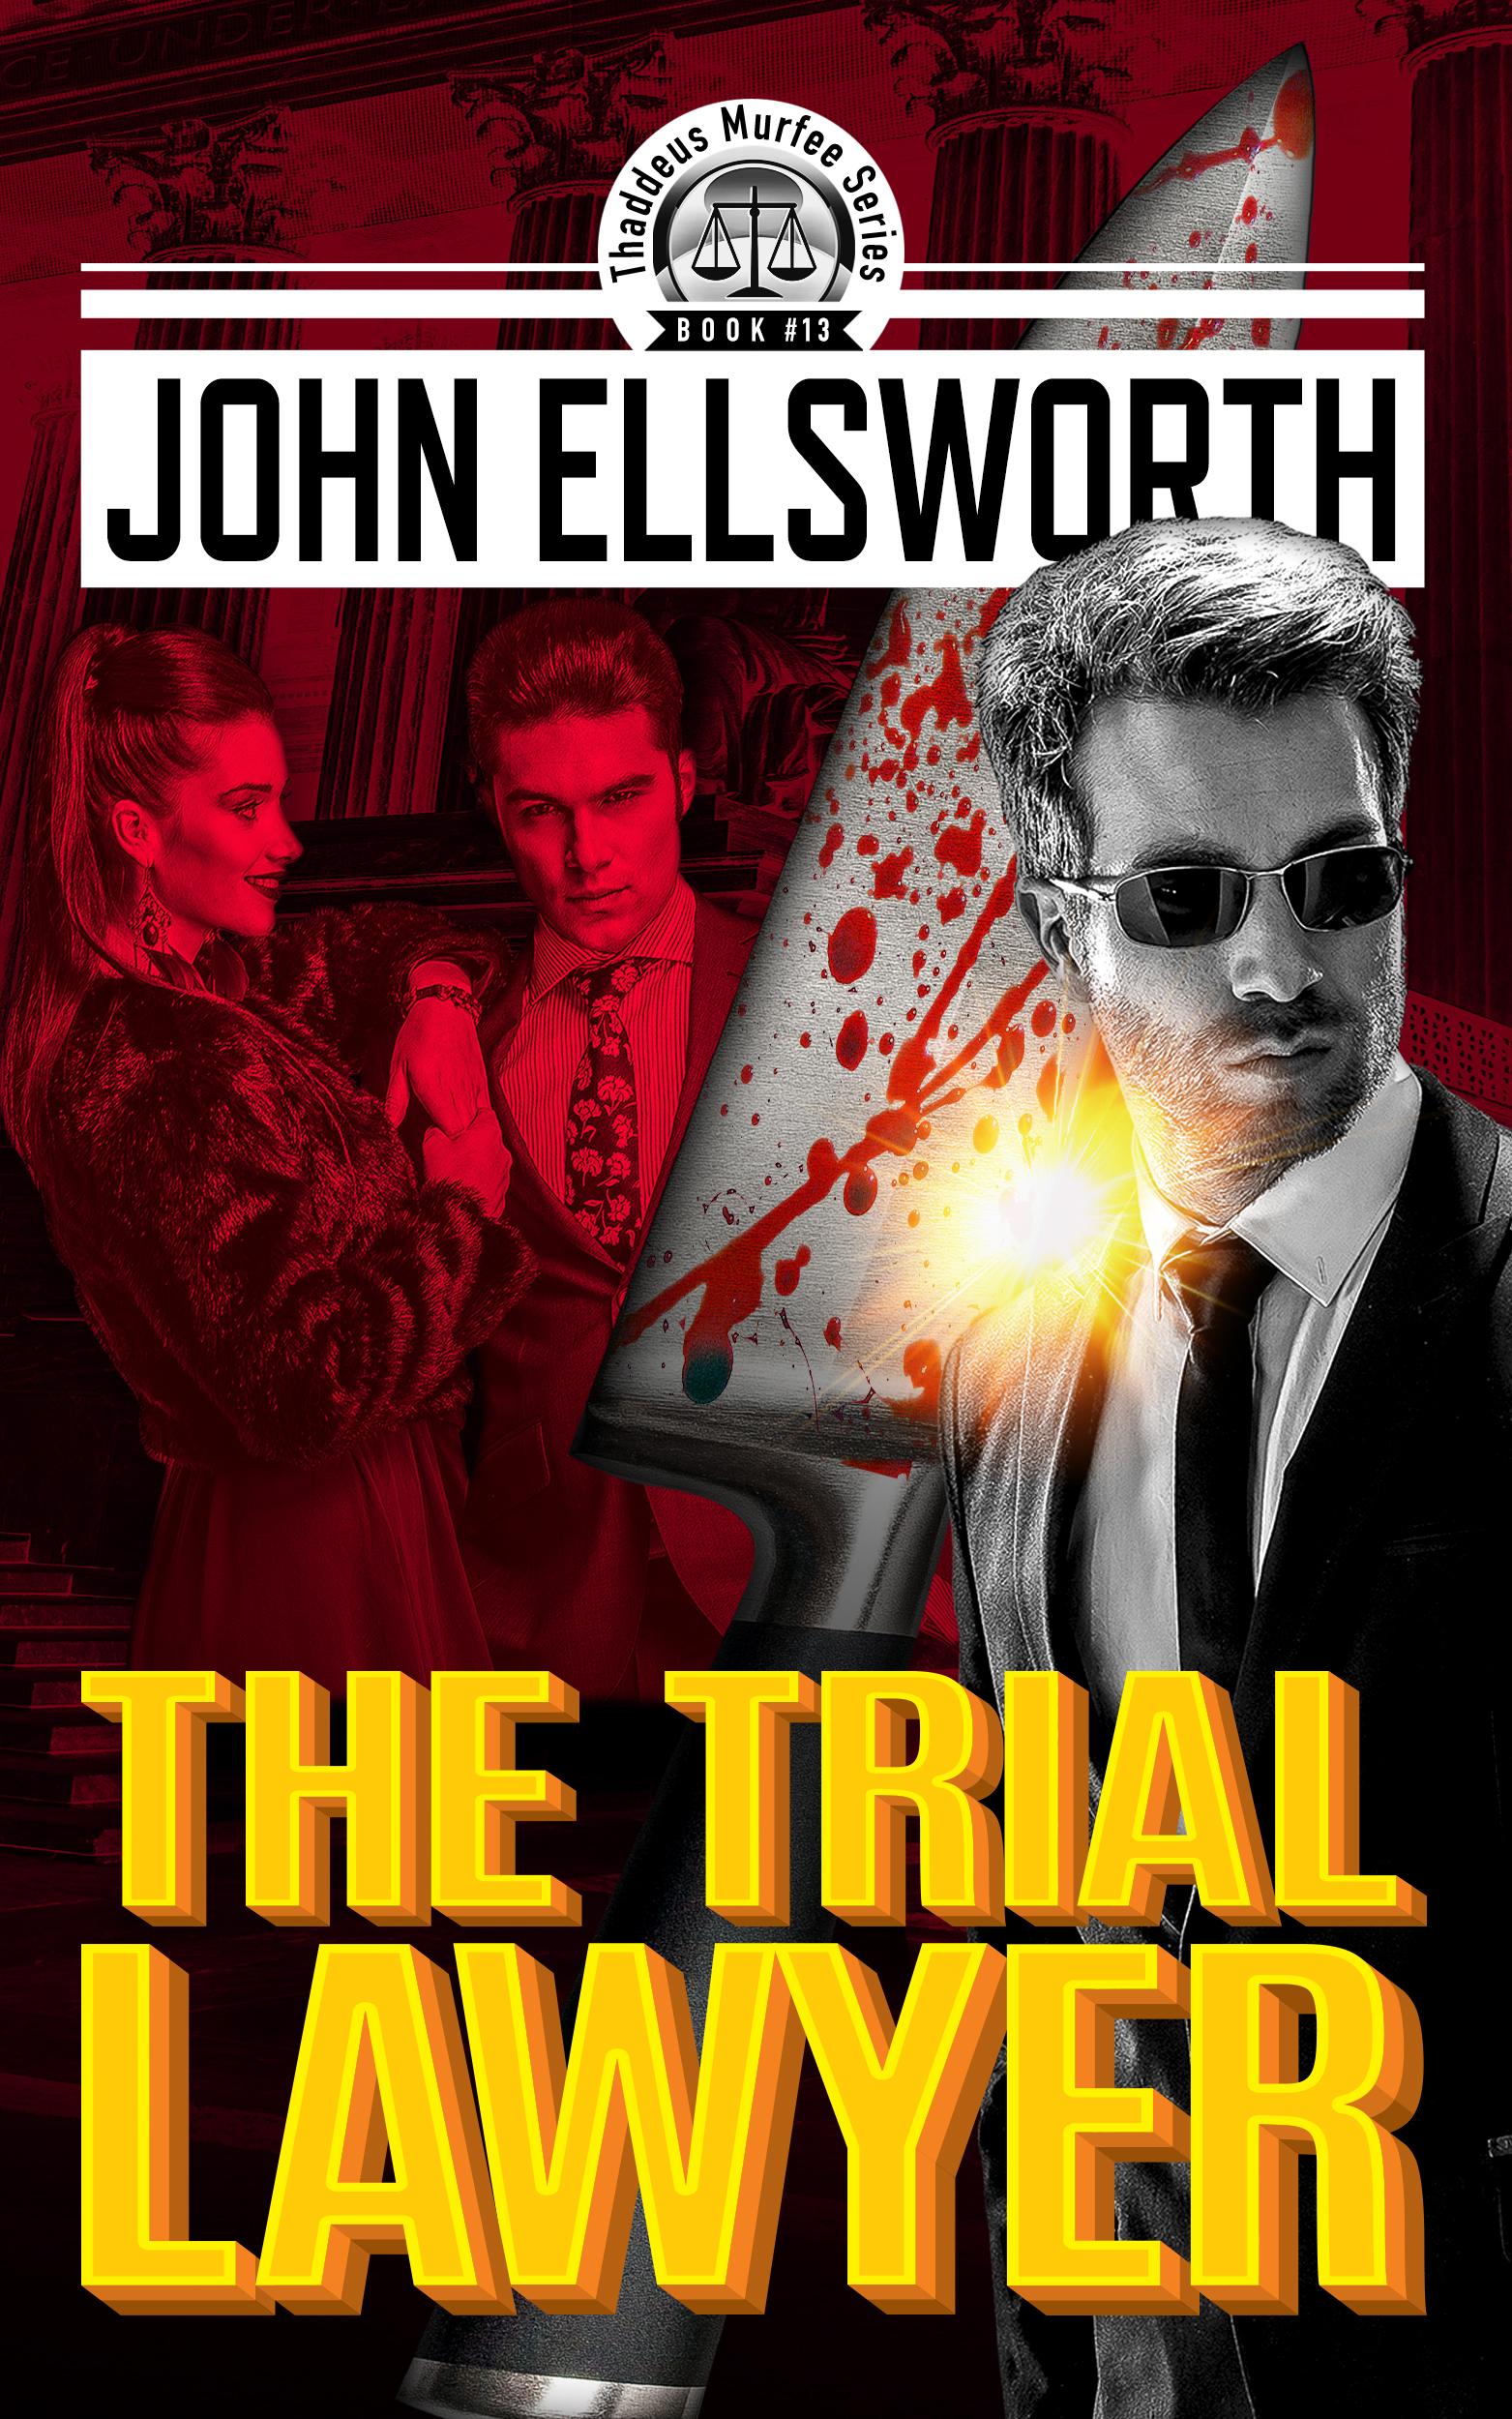 The Trial Lawyer by John Ellsworth